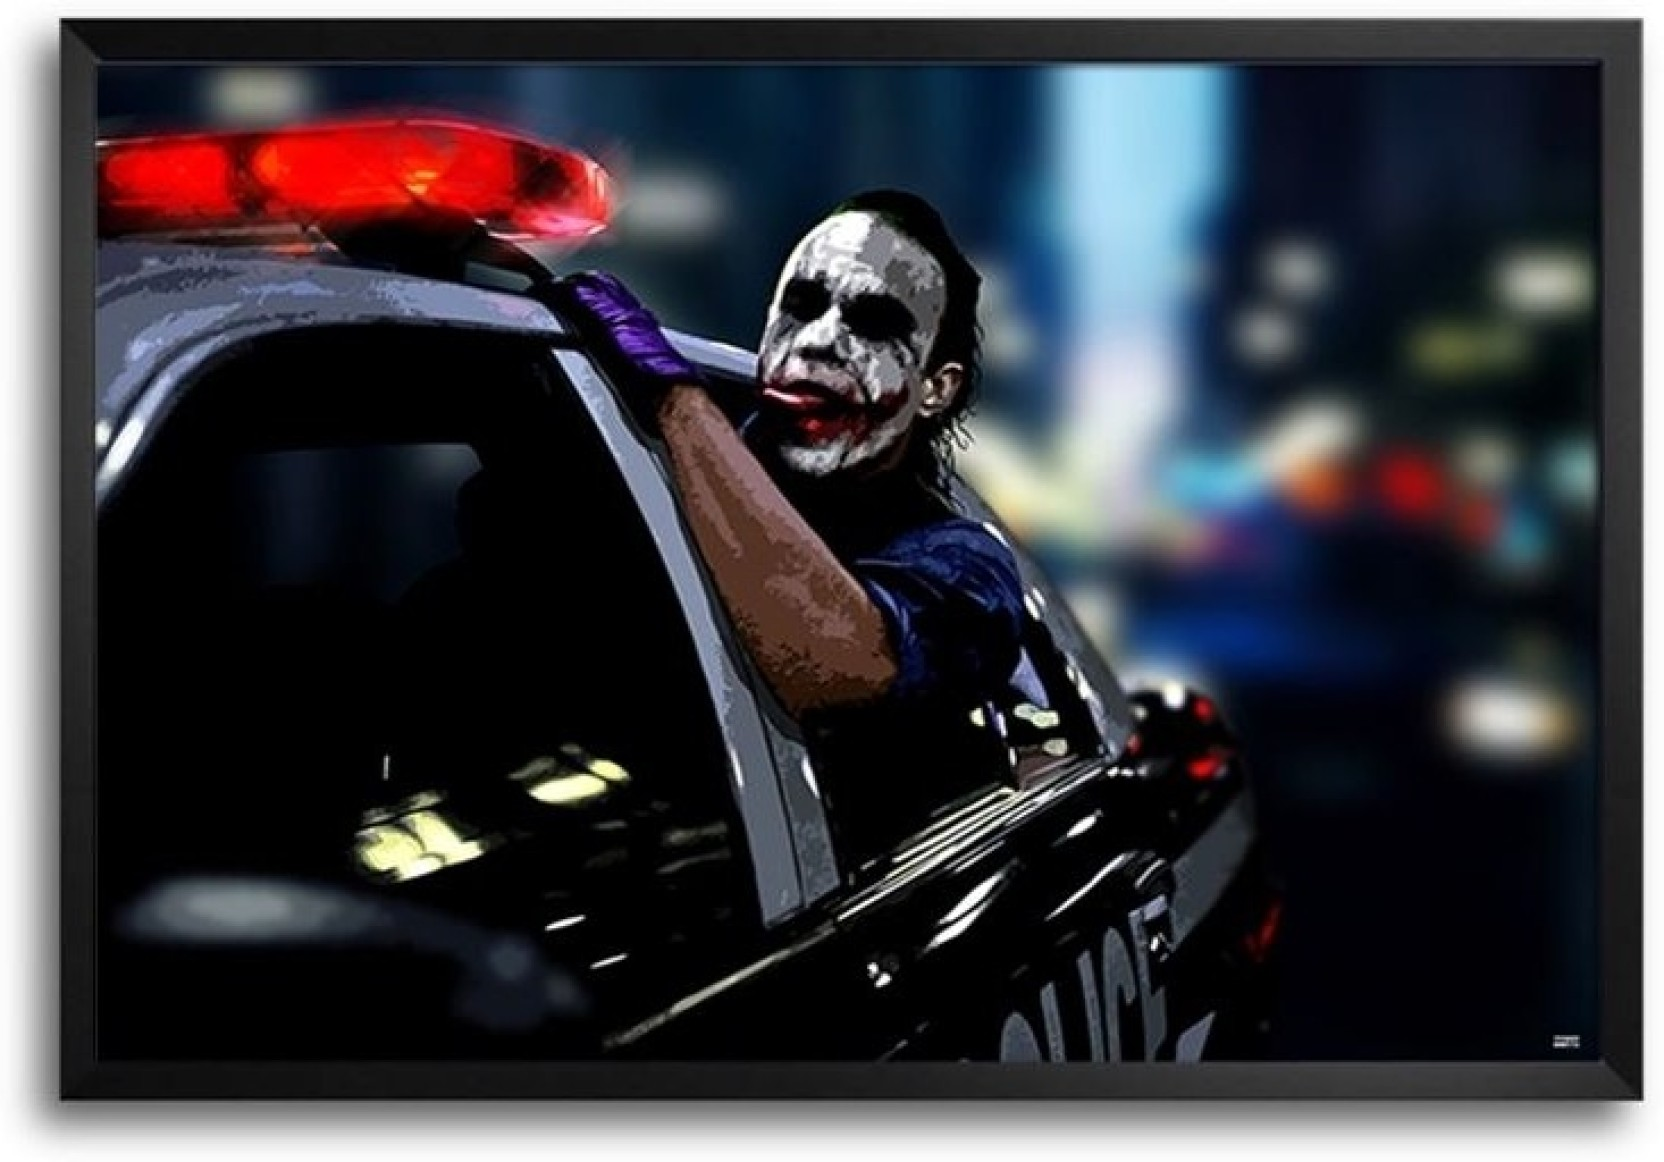 joker police car fp00003758 framed photographic paper